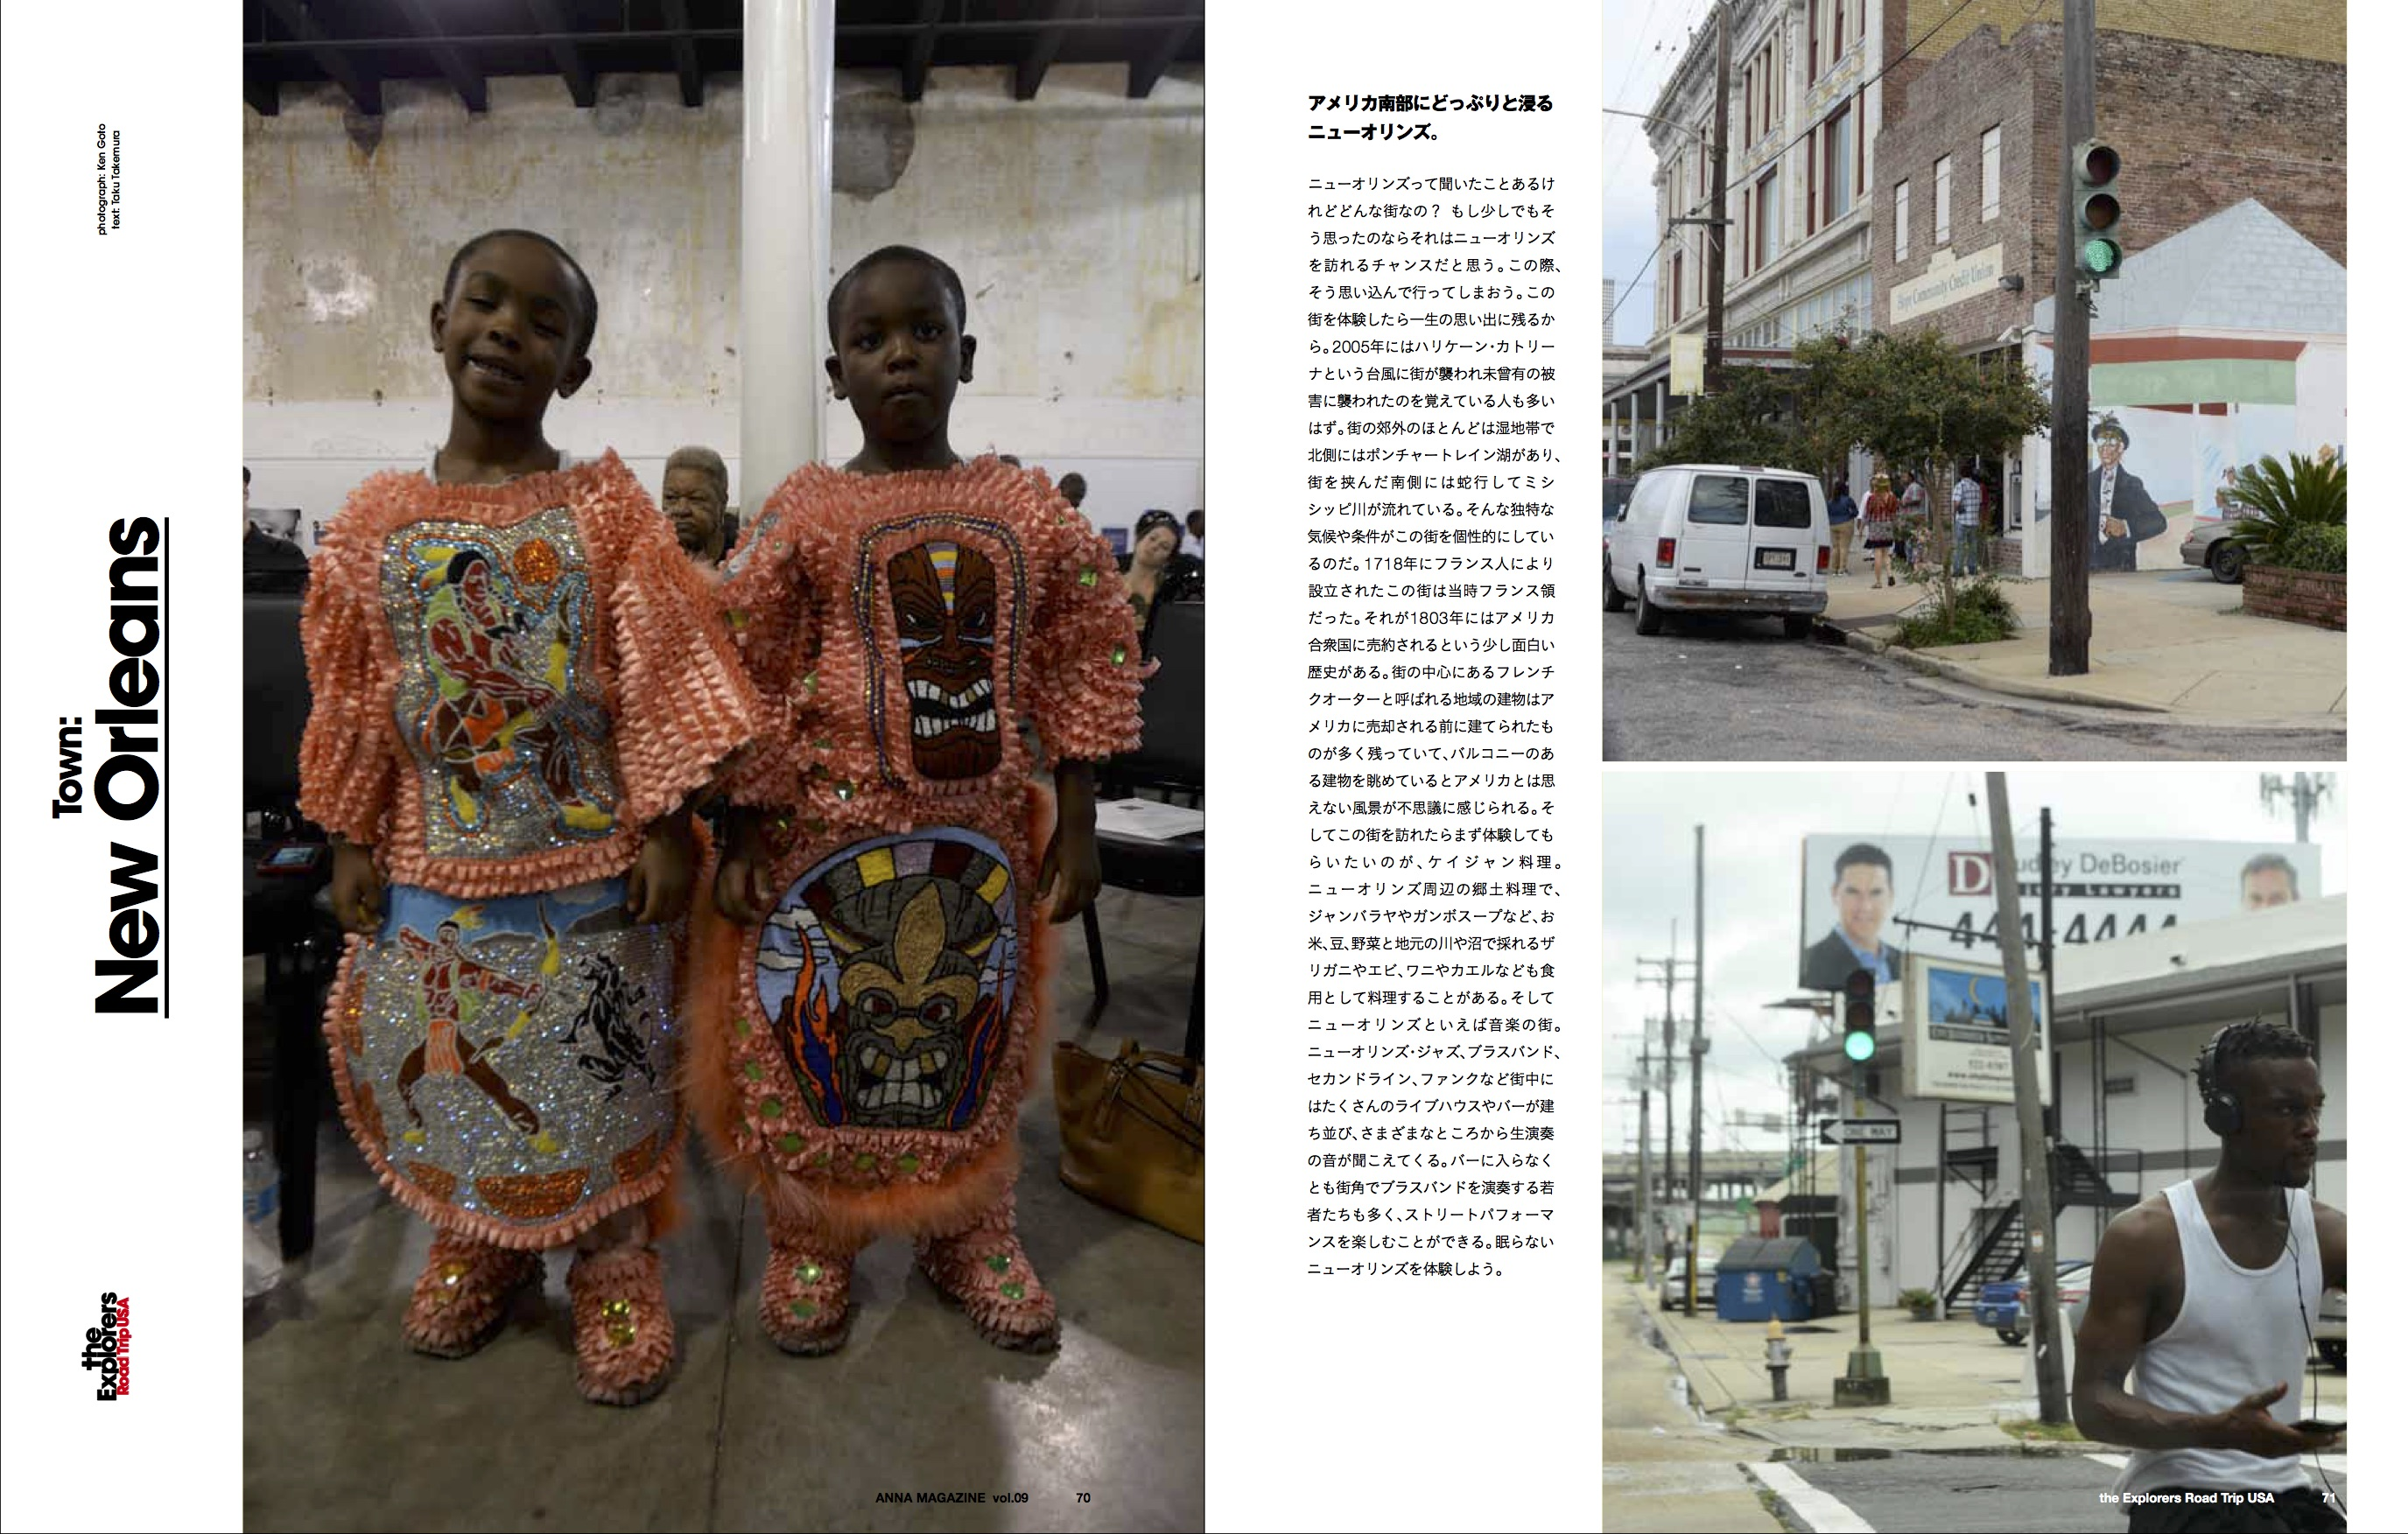 anna magazine vol.9 P34